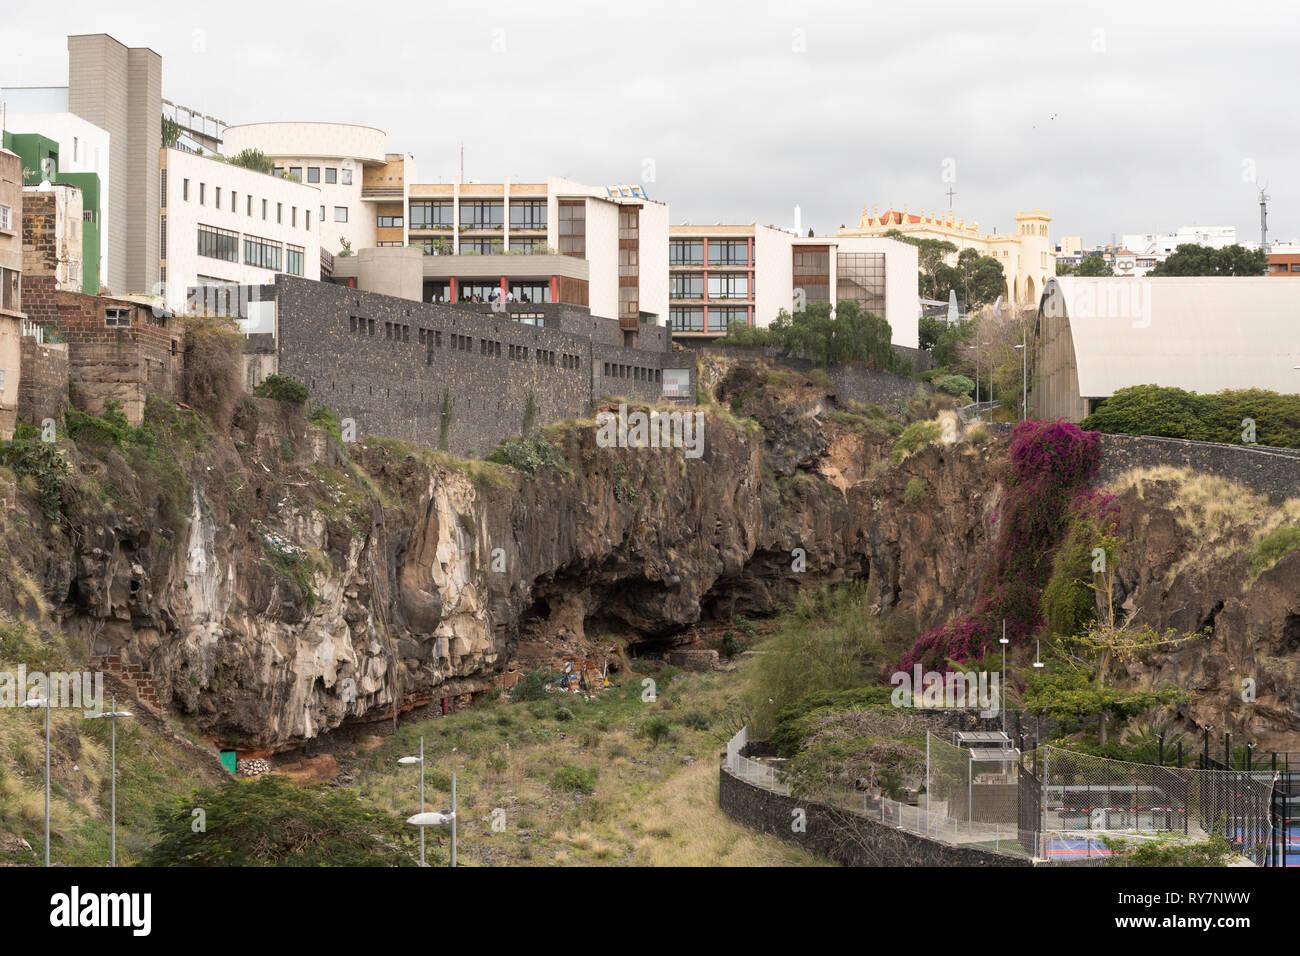 The Barranco de Santos, a gorge running through the centre of Santa Cruz de Tenerife, Tenerife, Canary Islands Stock Photo